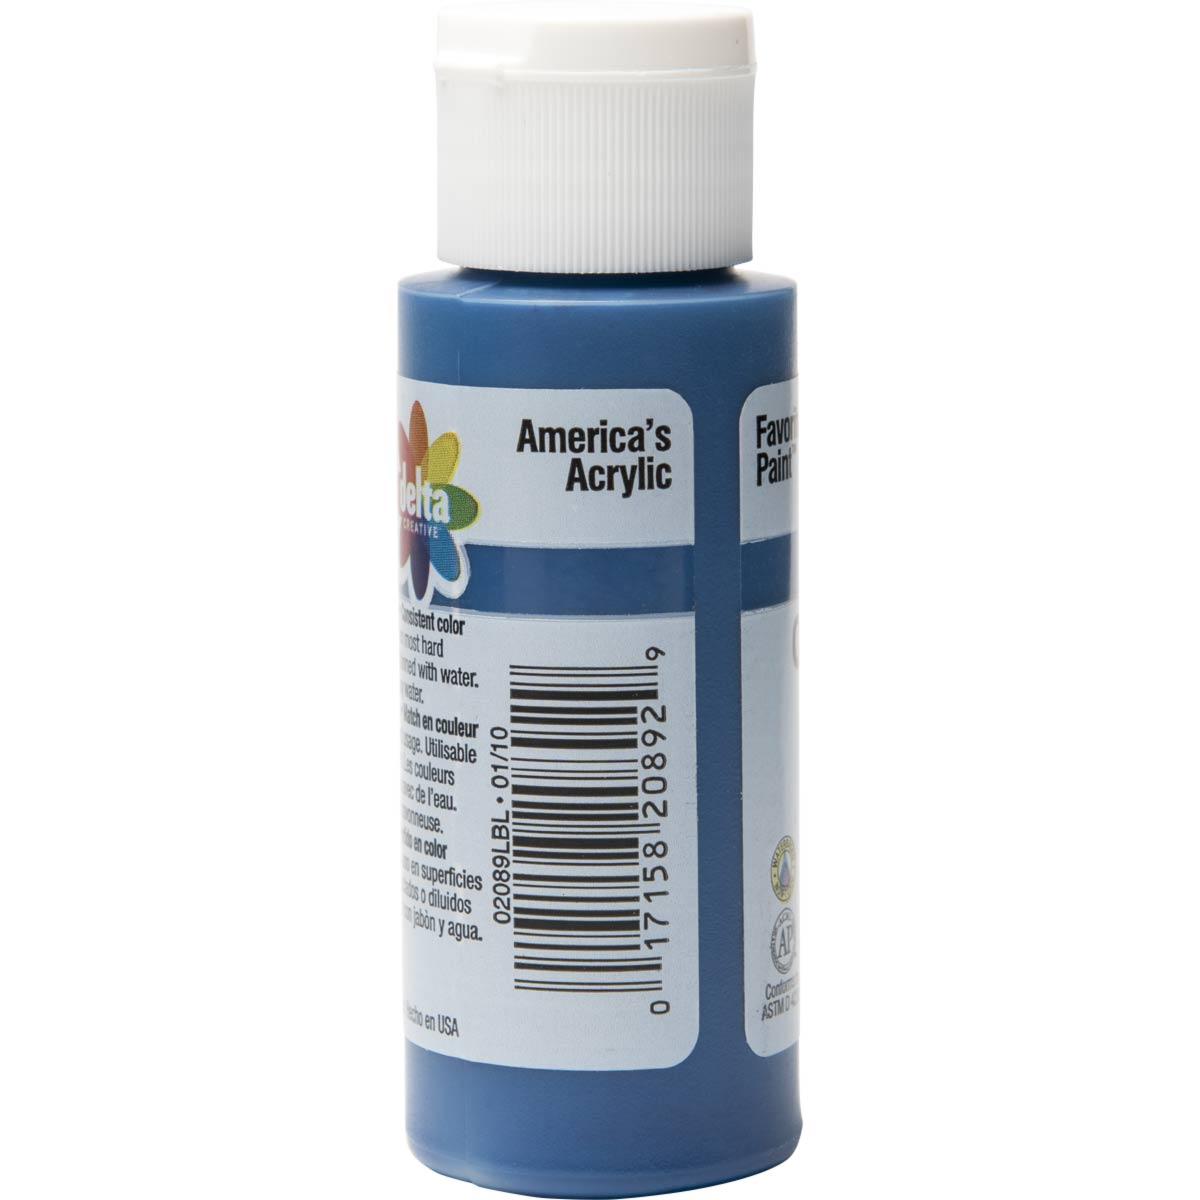 Delta Ceramcoat ® Acrylic Paint - Navy Blue, 2 oz. - 020890202W